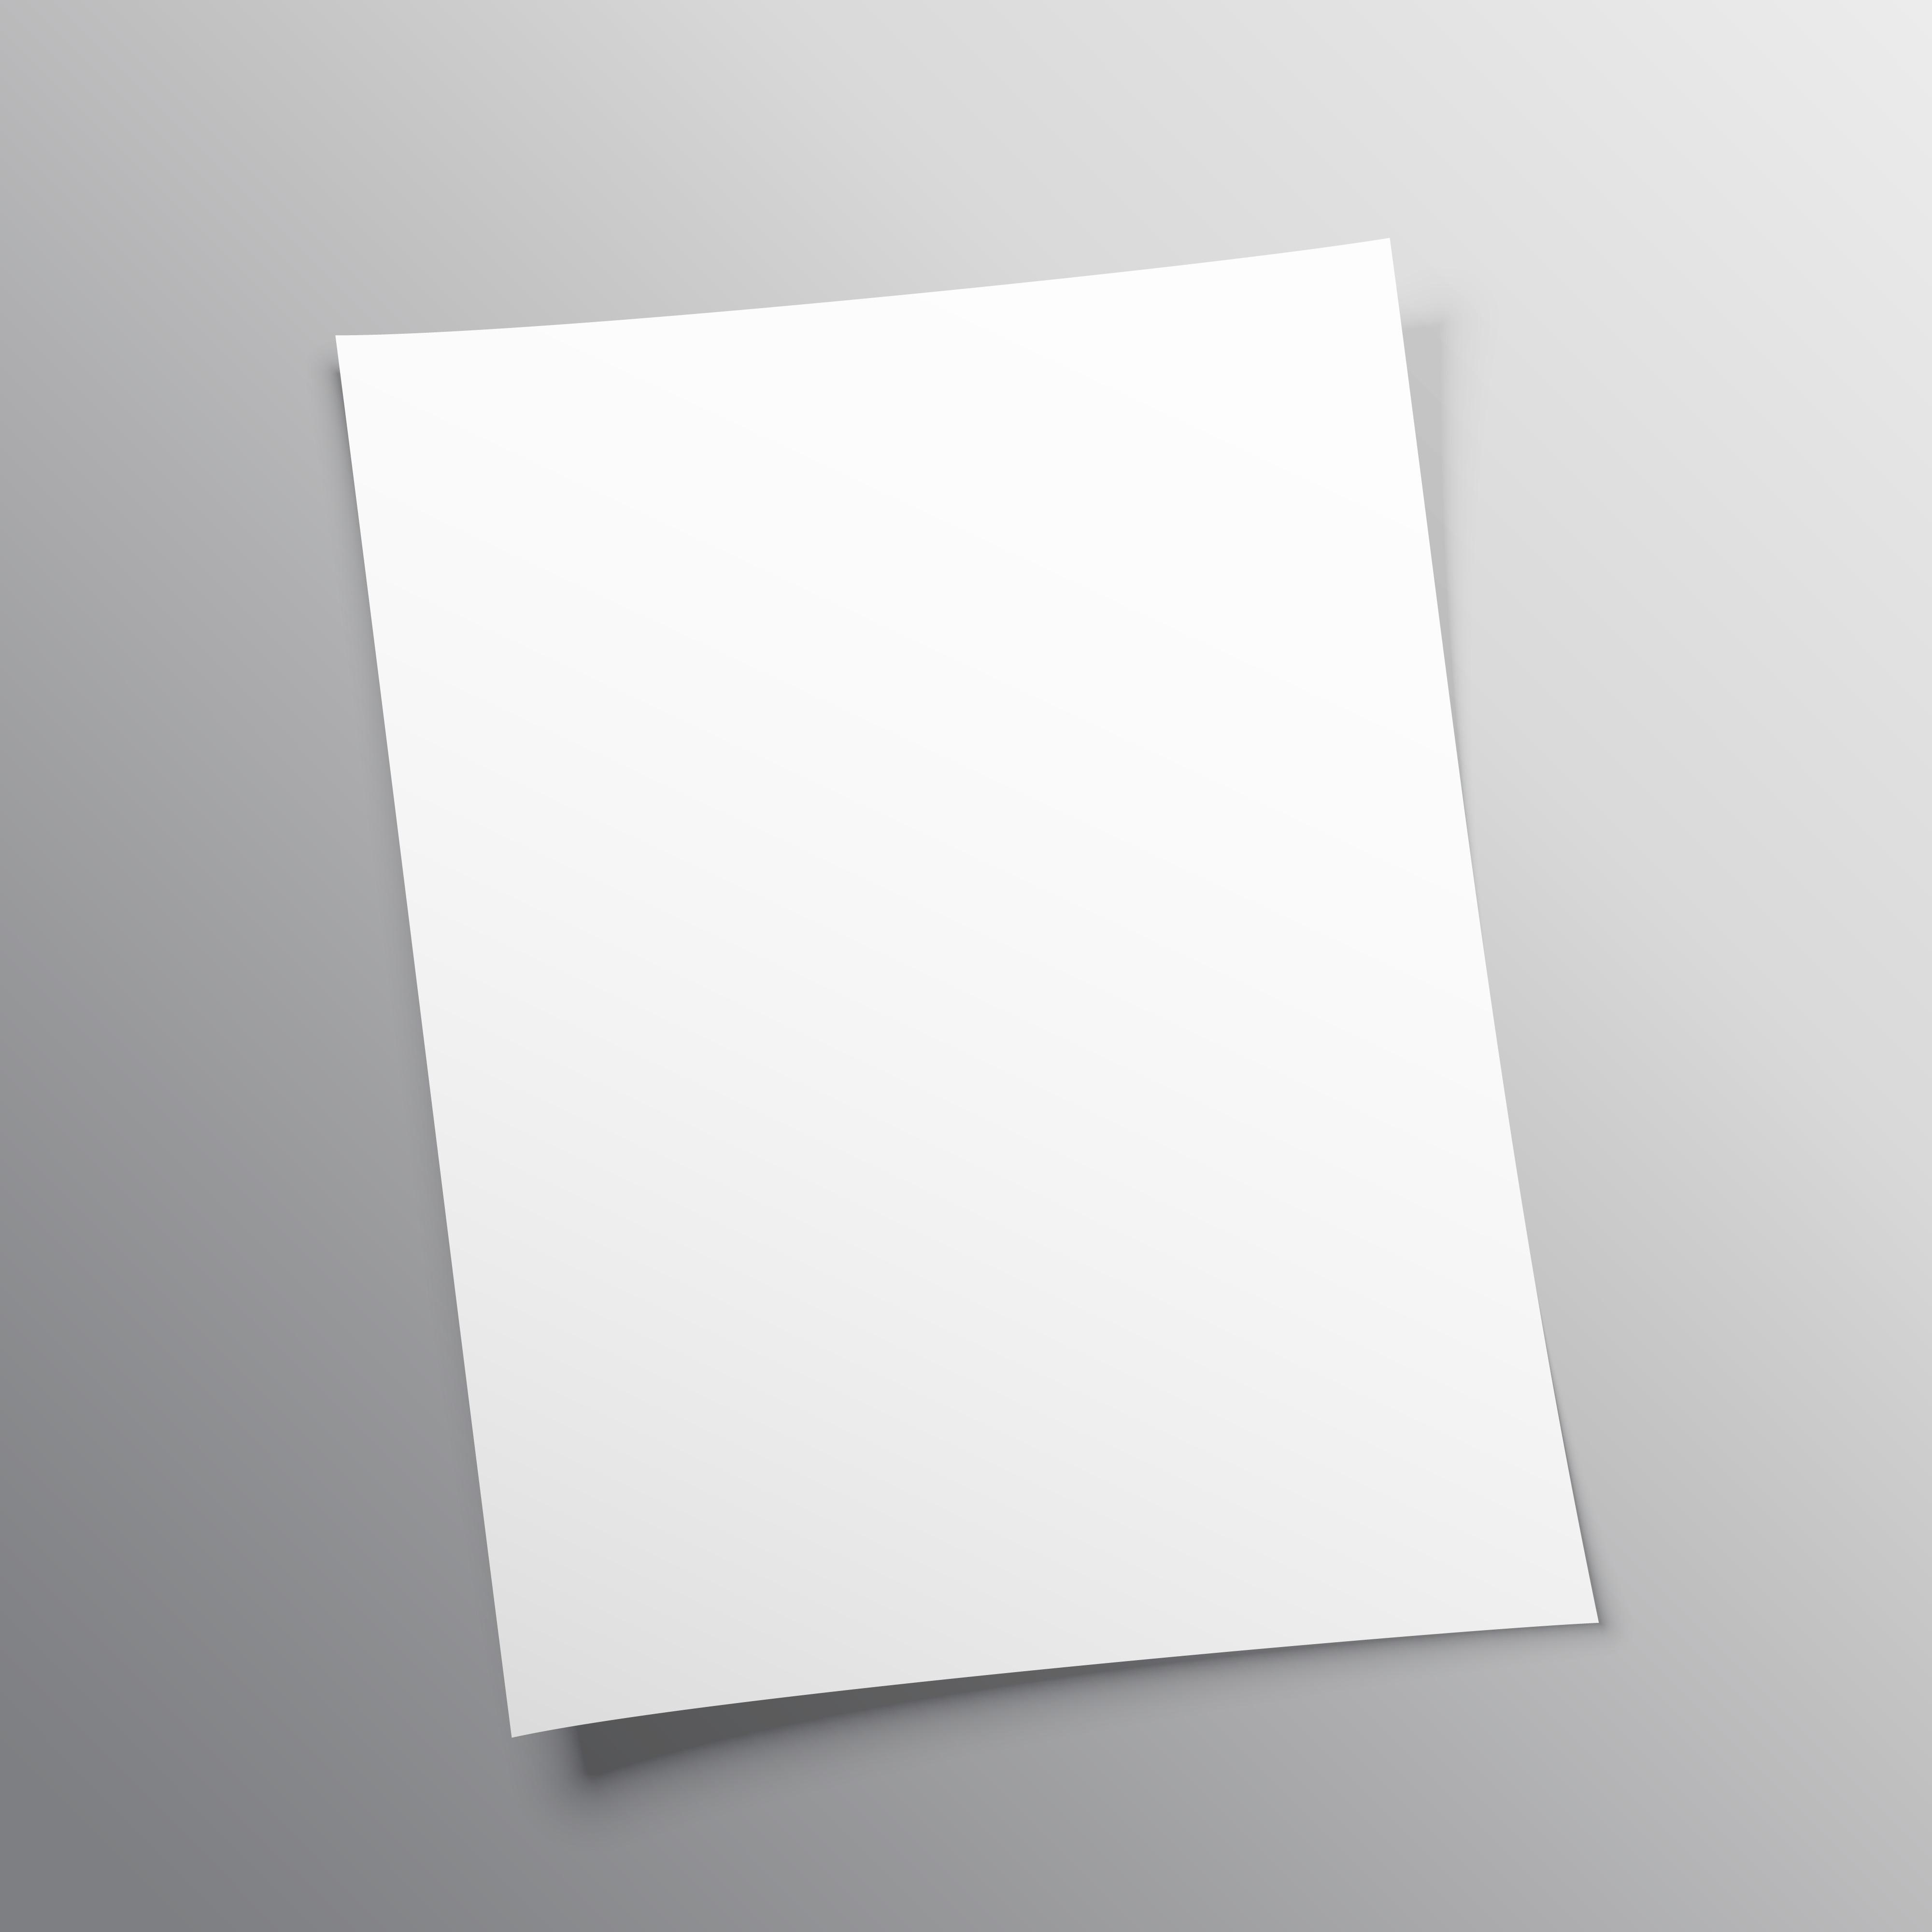 Blank Paper Free Vector Art